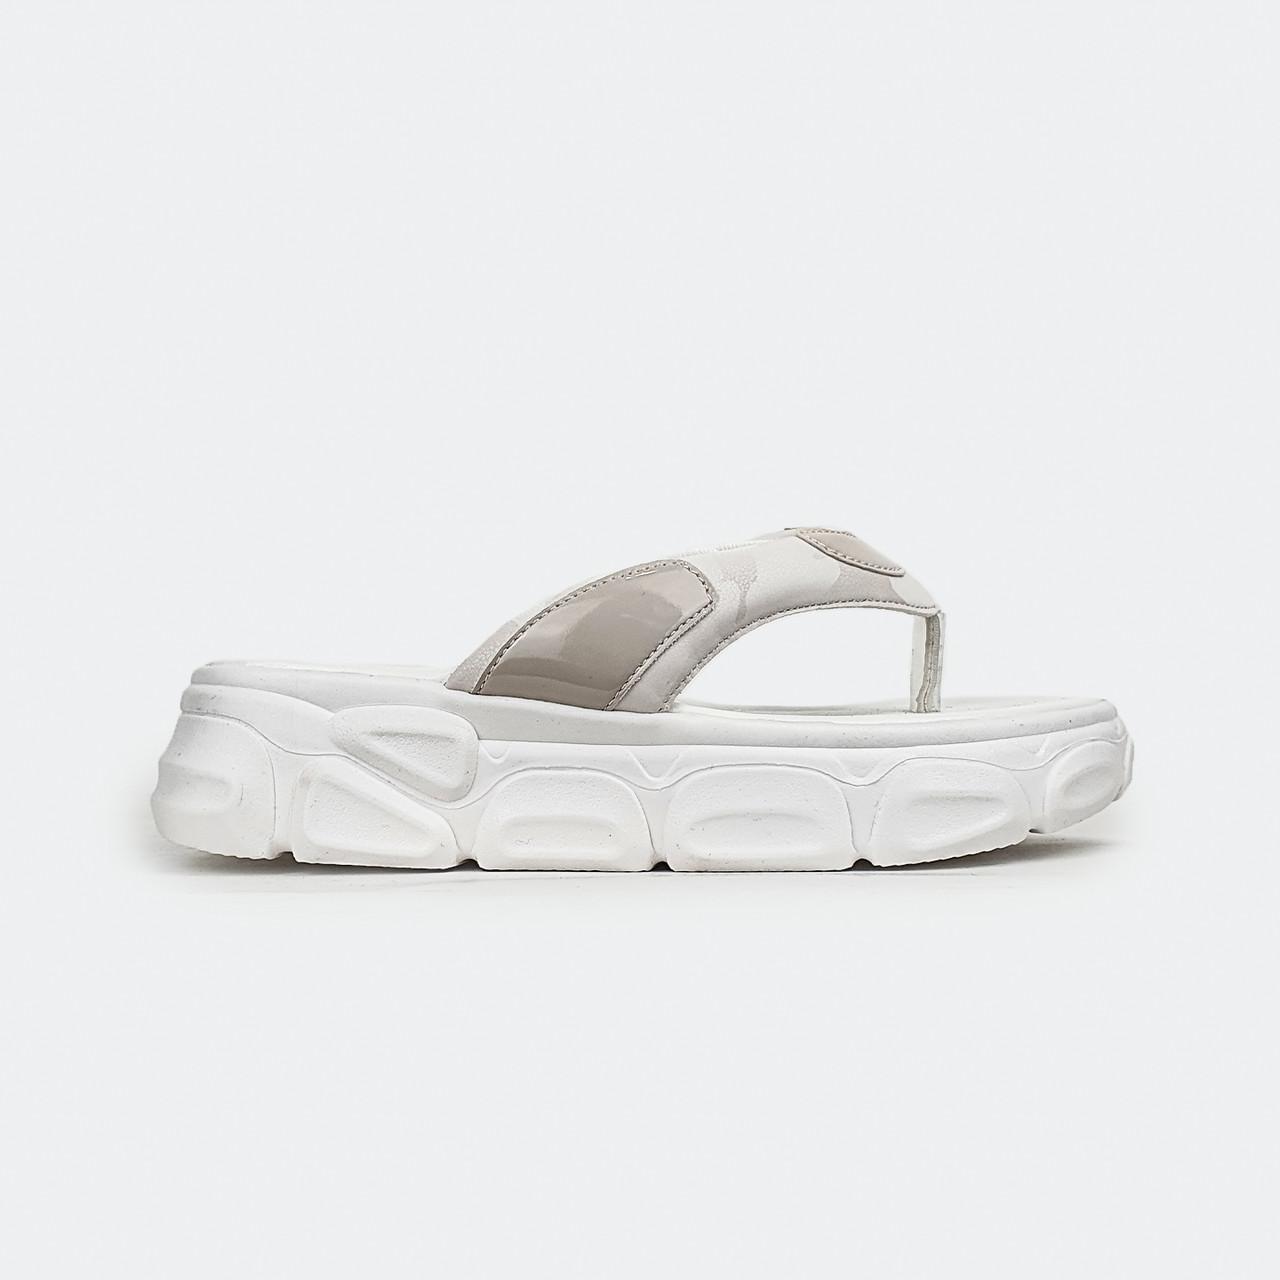 Удобные, модные шлепанцы через палец на платформе белые Fashion 888-1